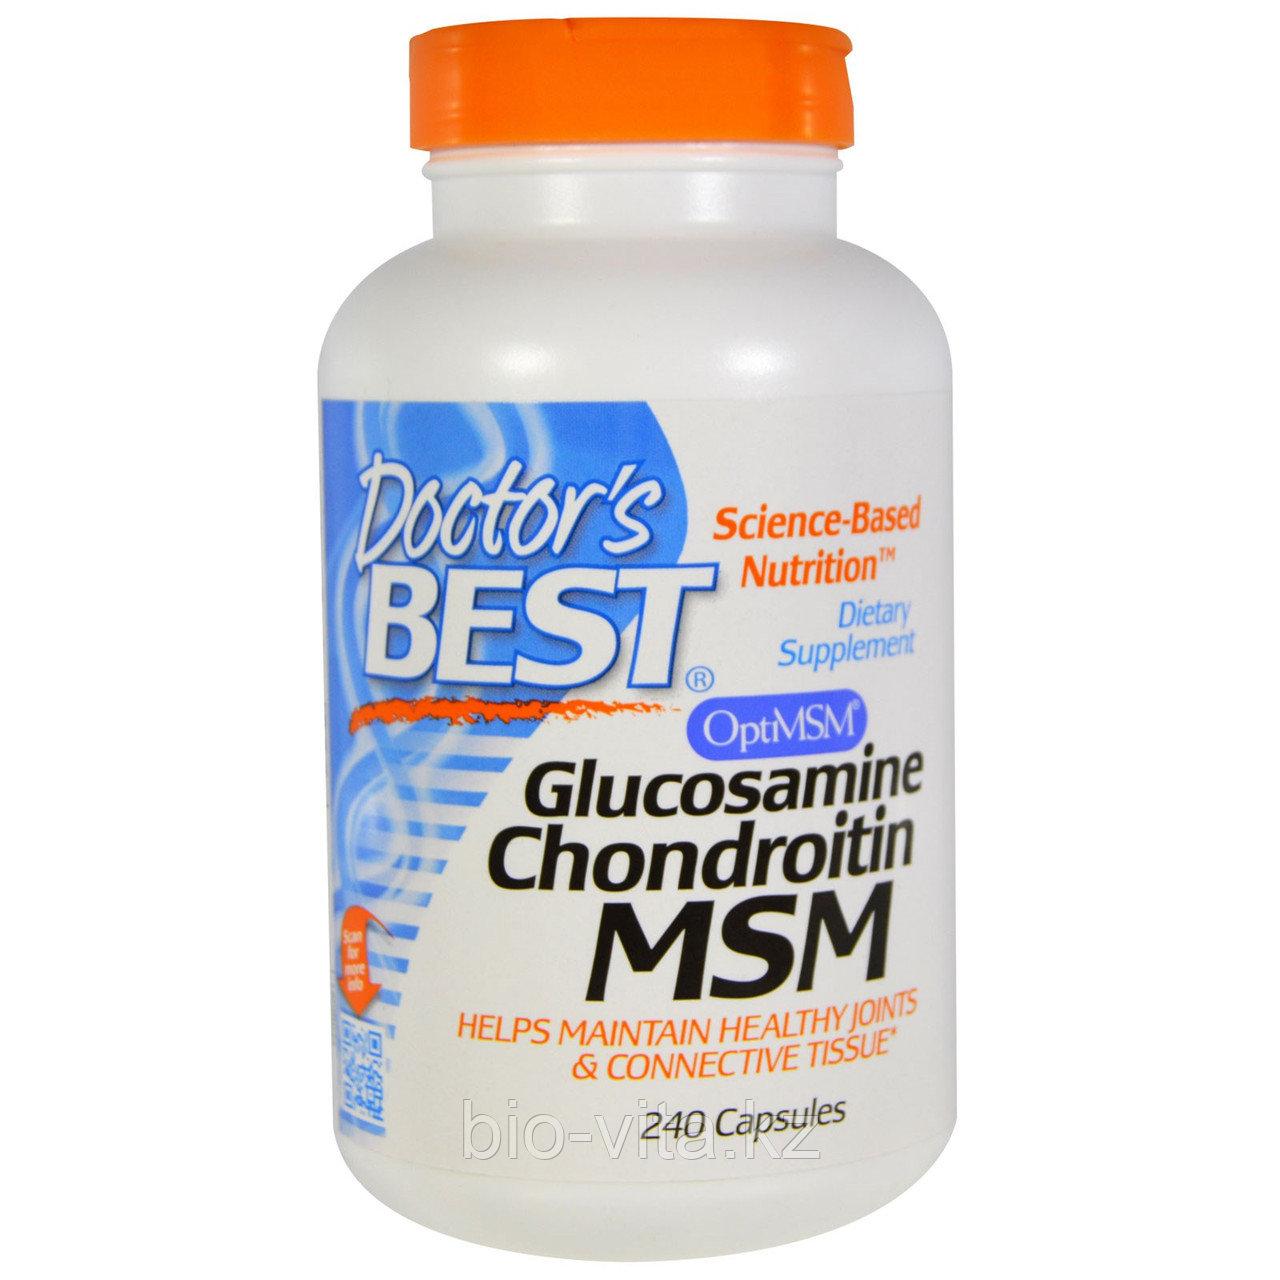 Глюкозамин и хондроитин с MСM, 240 Capsules Doctor's Best